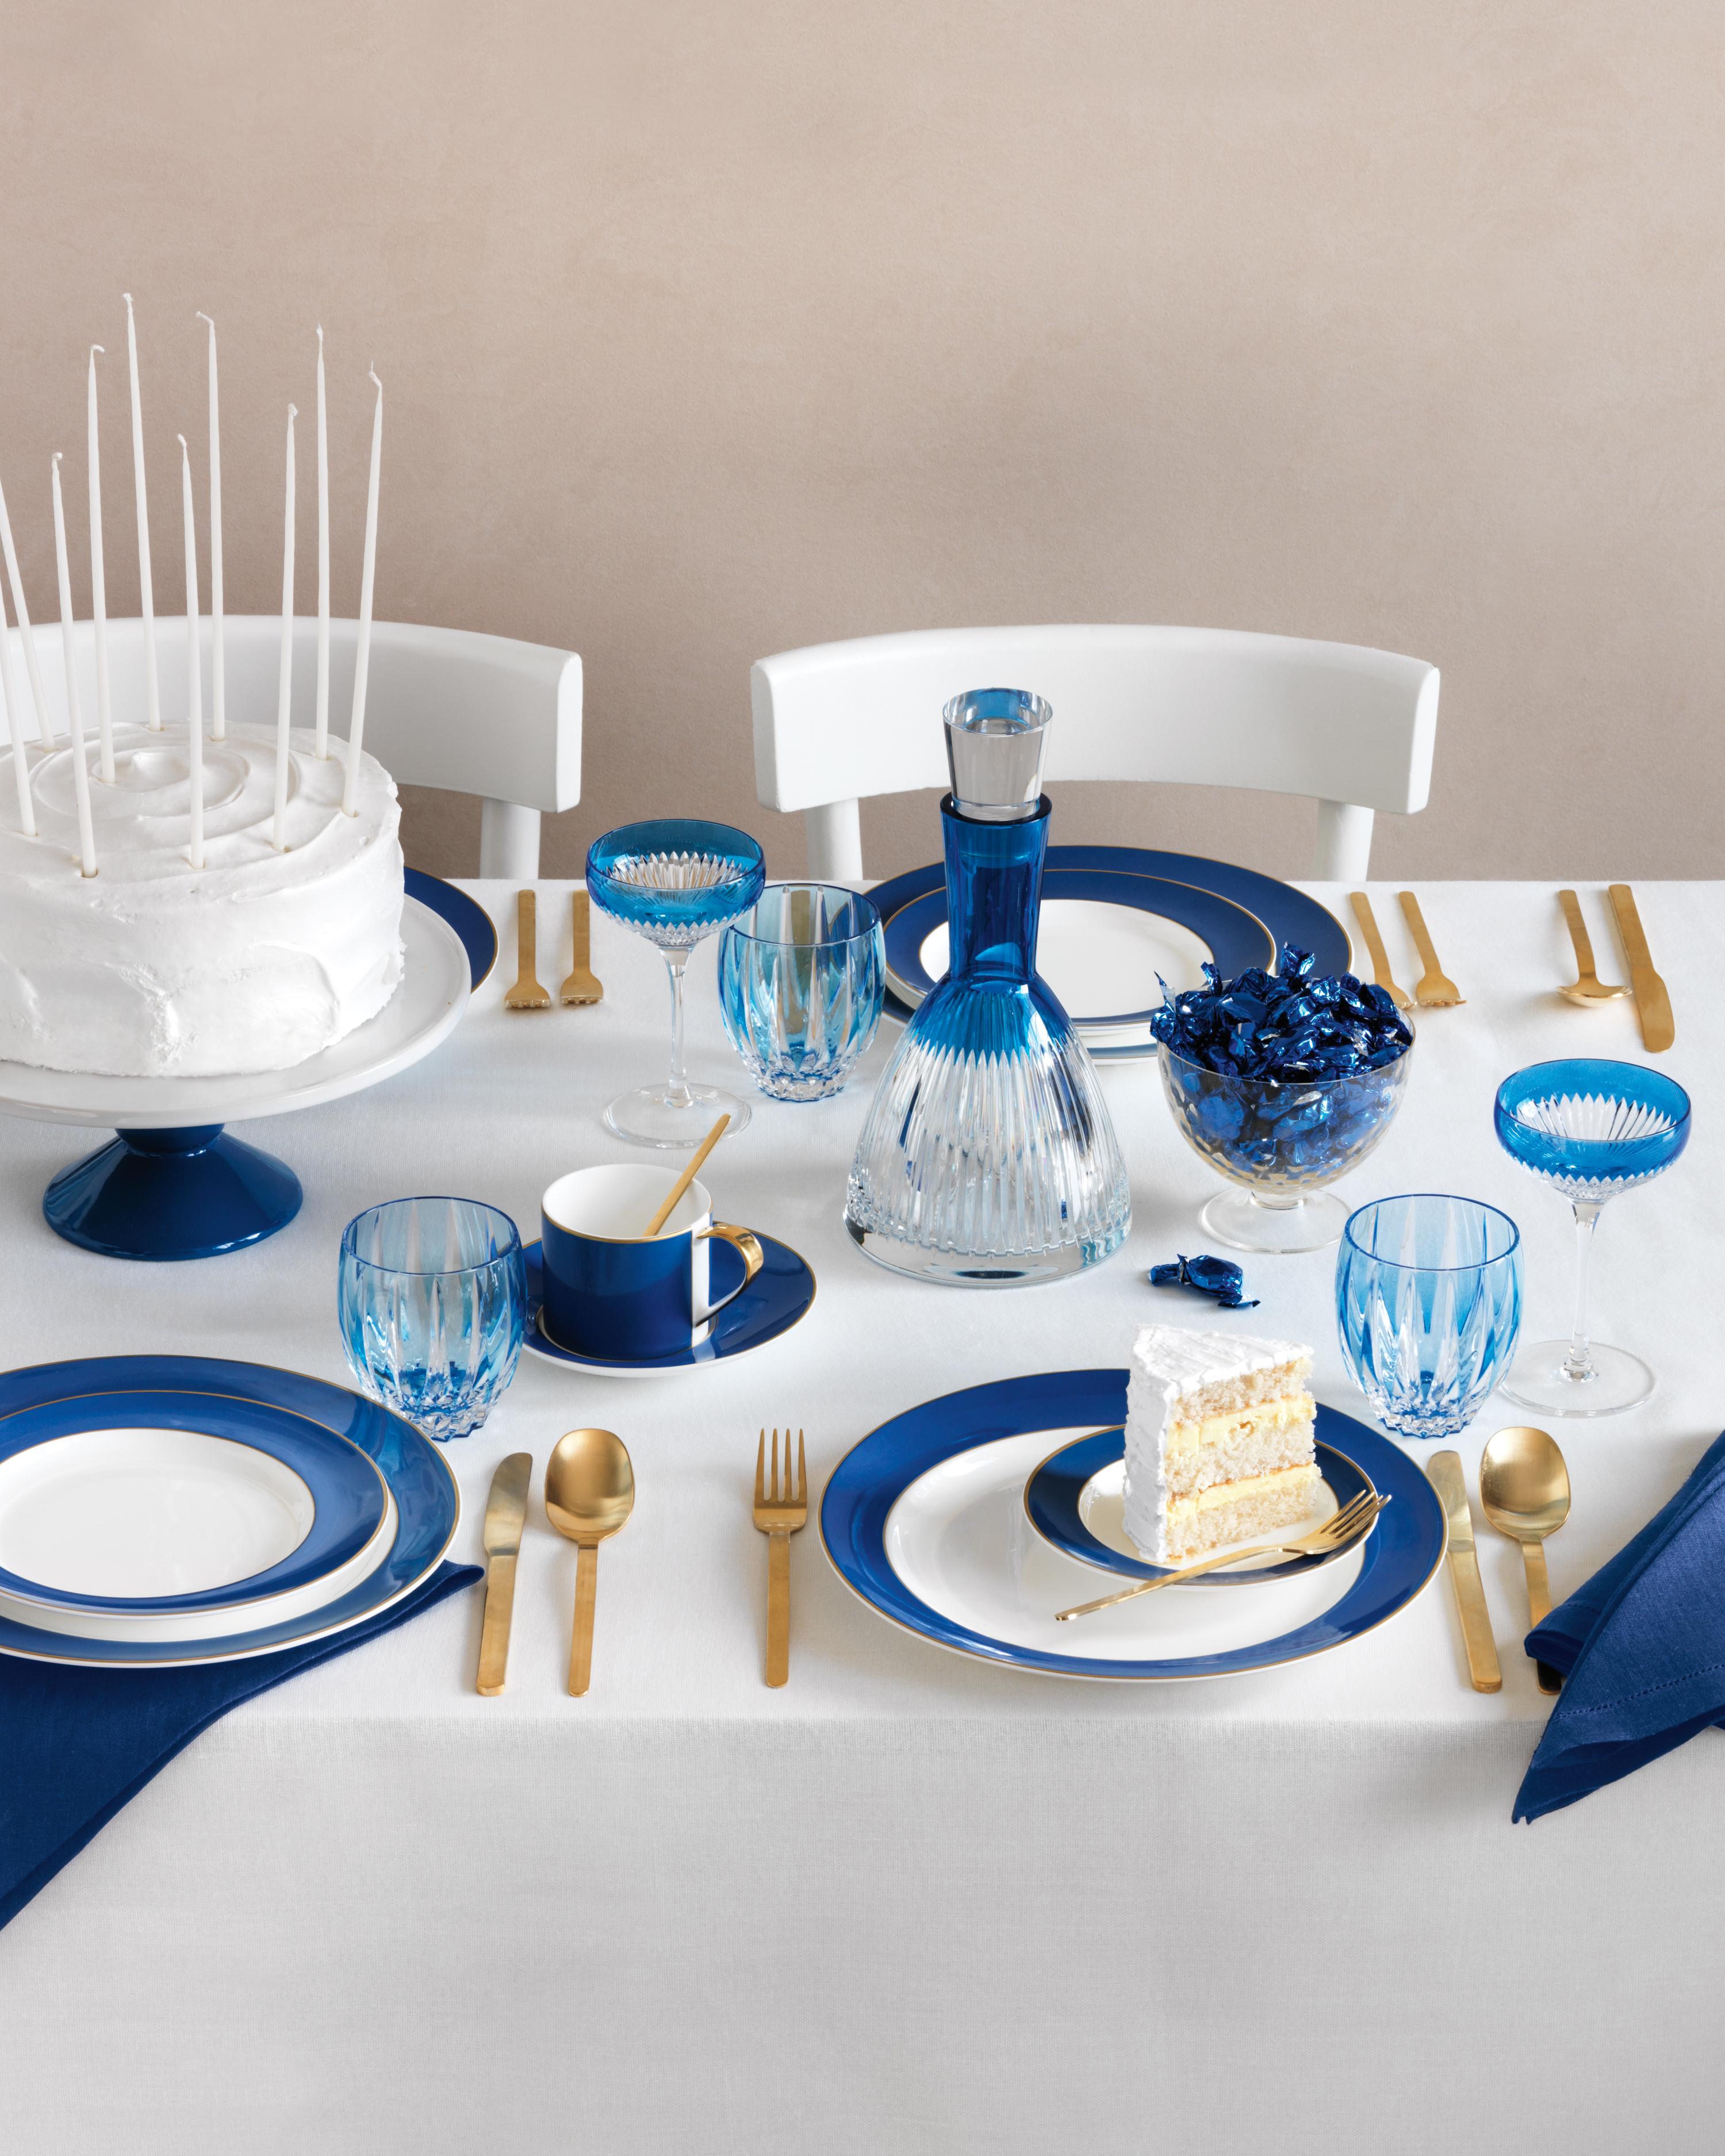 blue-table-077-mwd109608.jpg